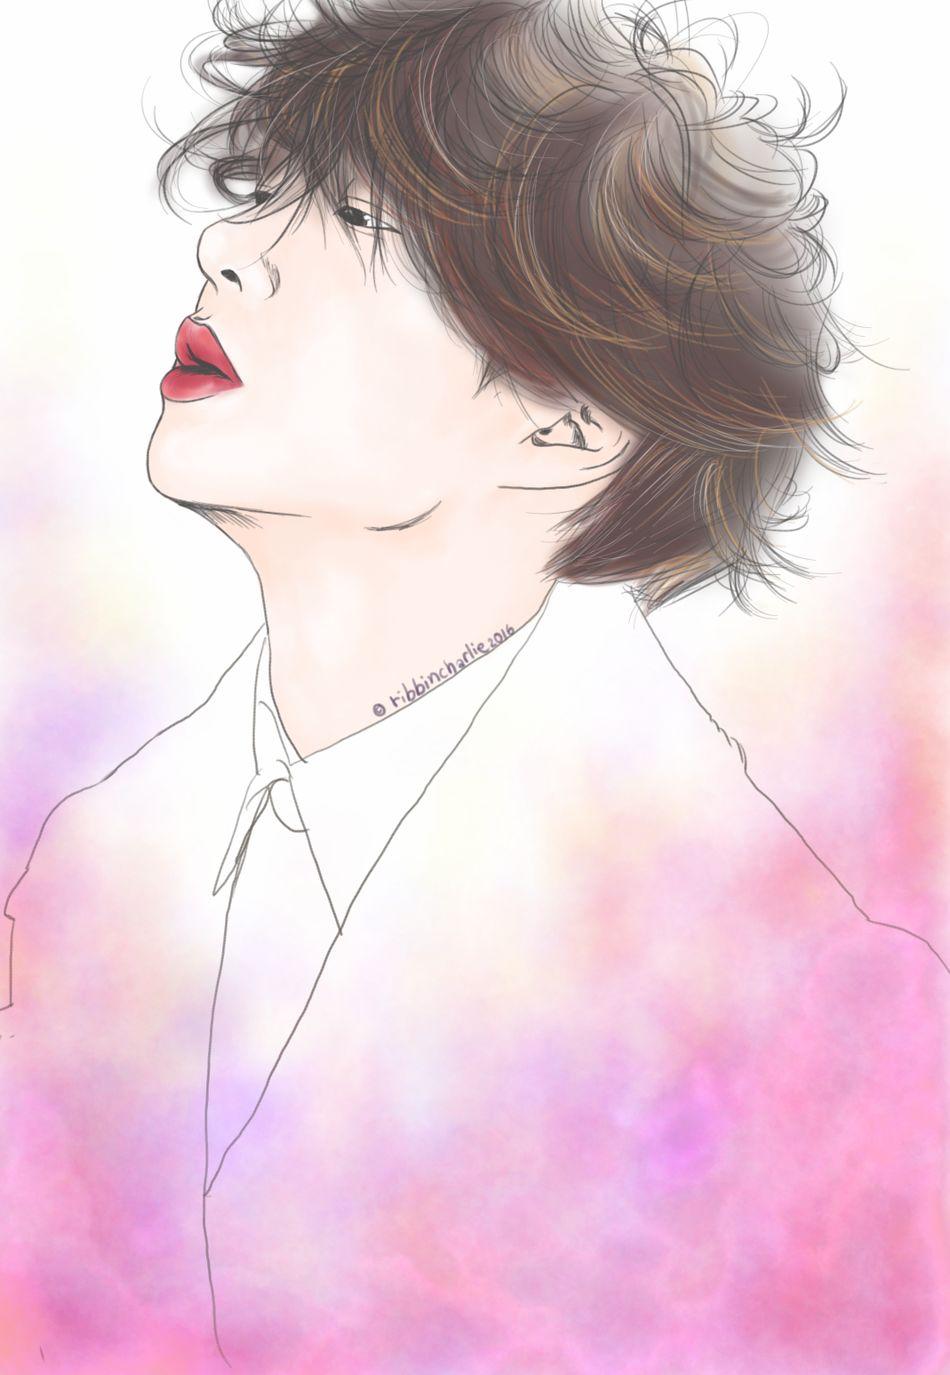 Saturday hobby 🎨 One Person Adult Dreamlike People Portrait Painting Drawing Fanart Fanartdrawings Fanartkpop BTOB Changsub Btob Changsub